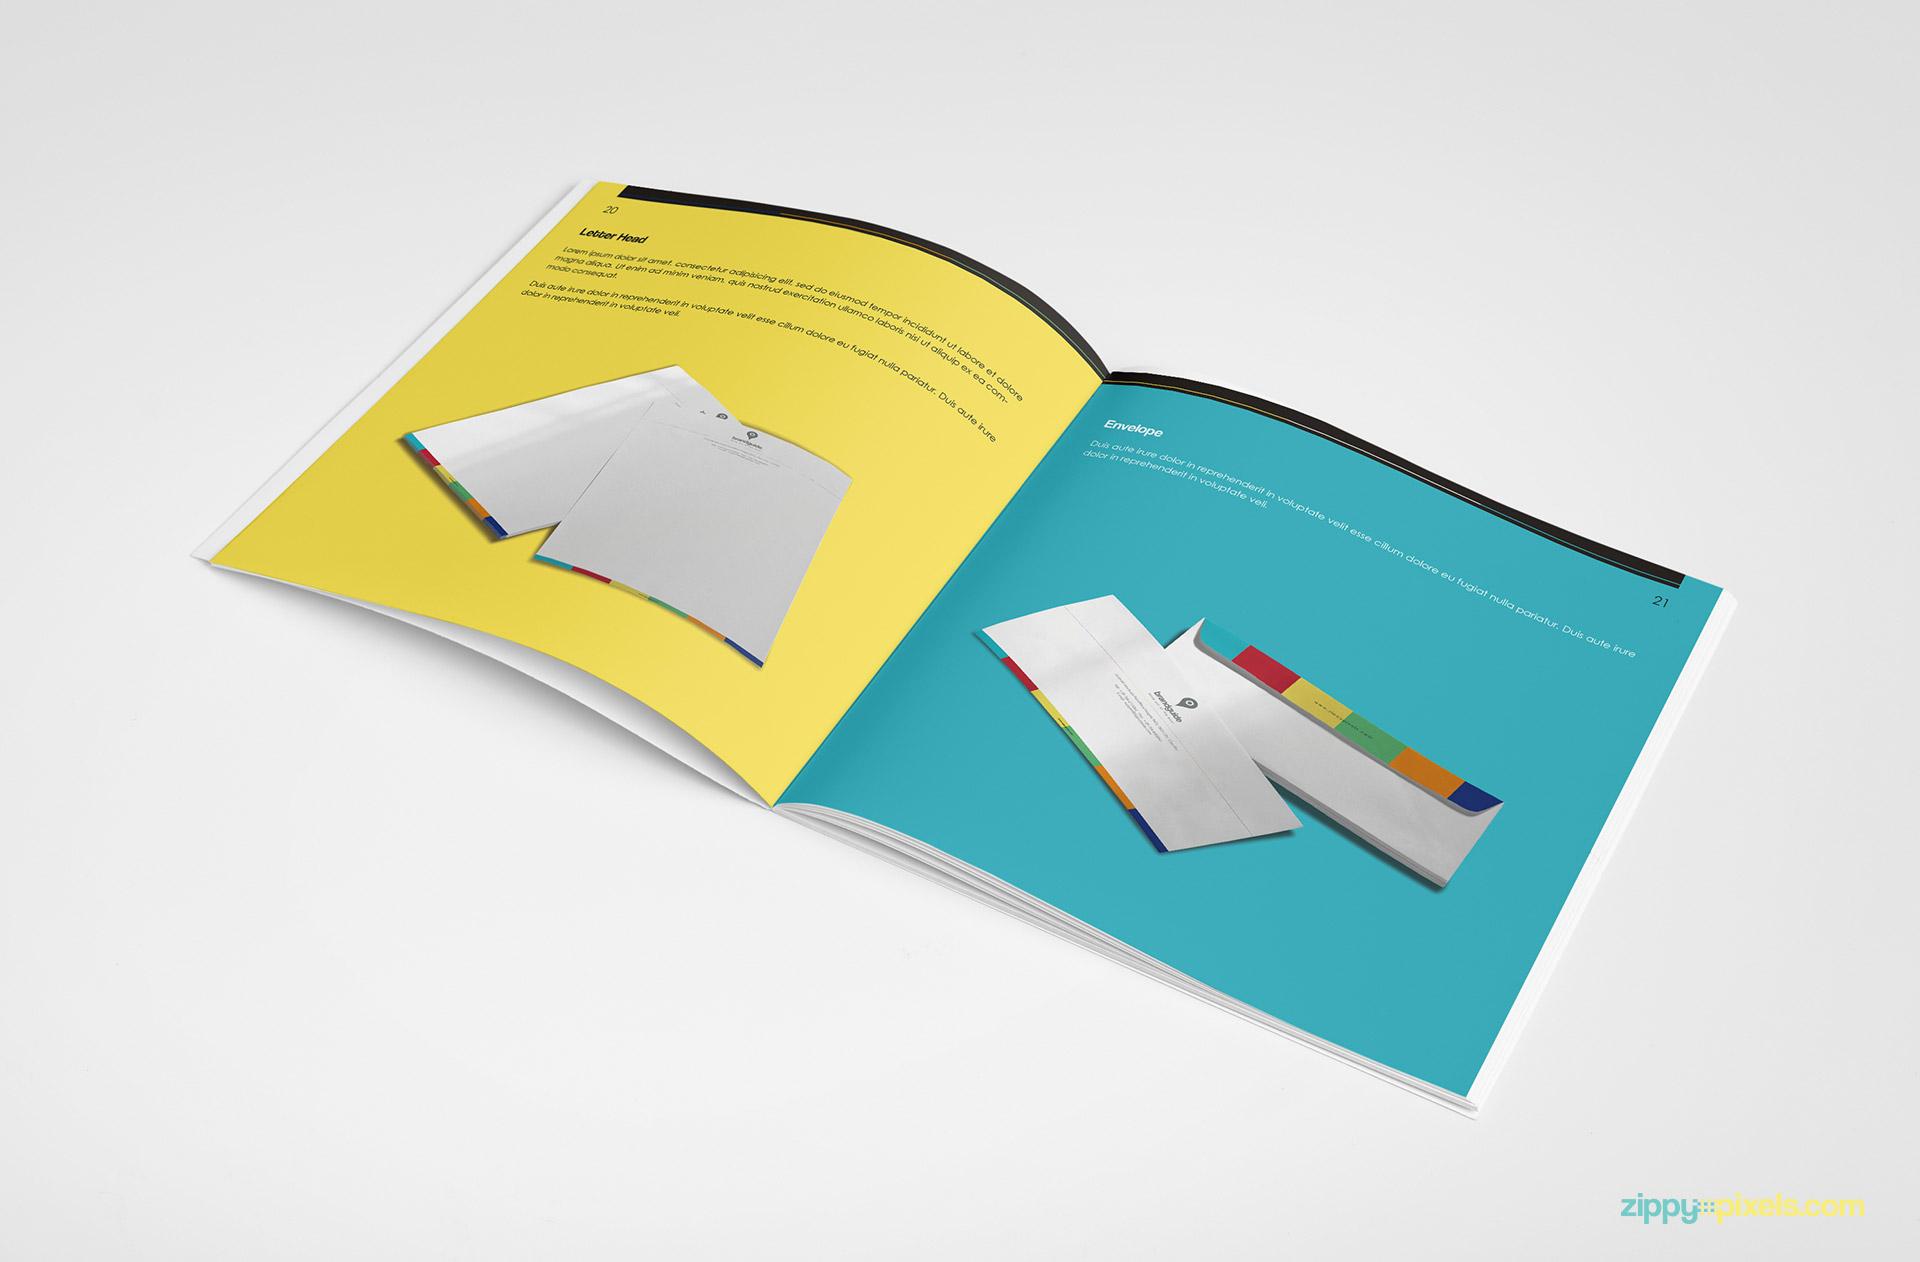 14-brand-book-12-letter-head-print-media